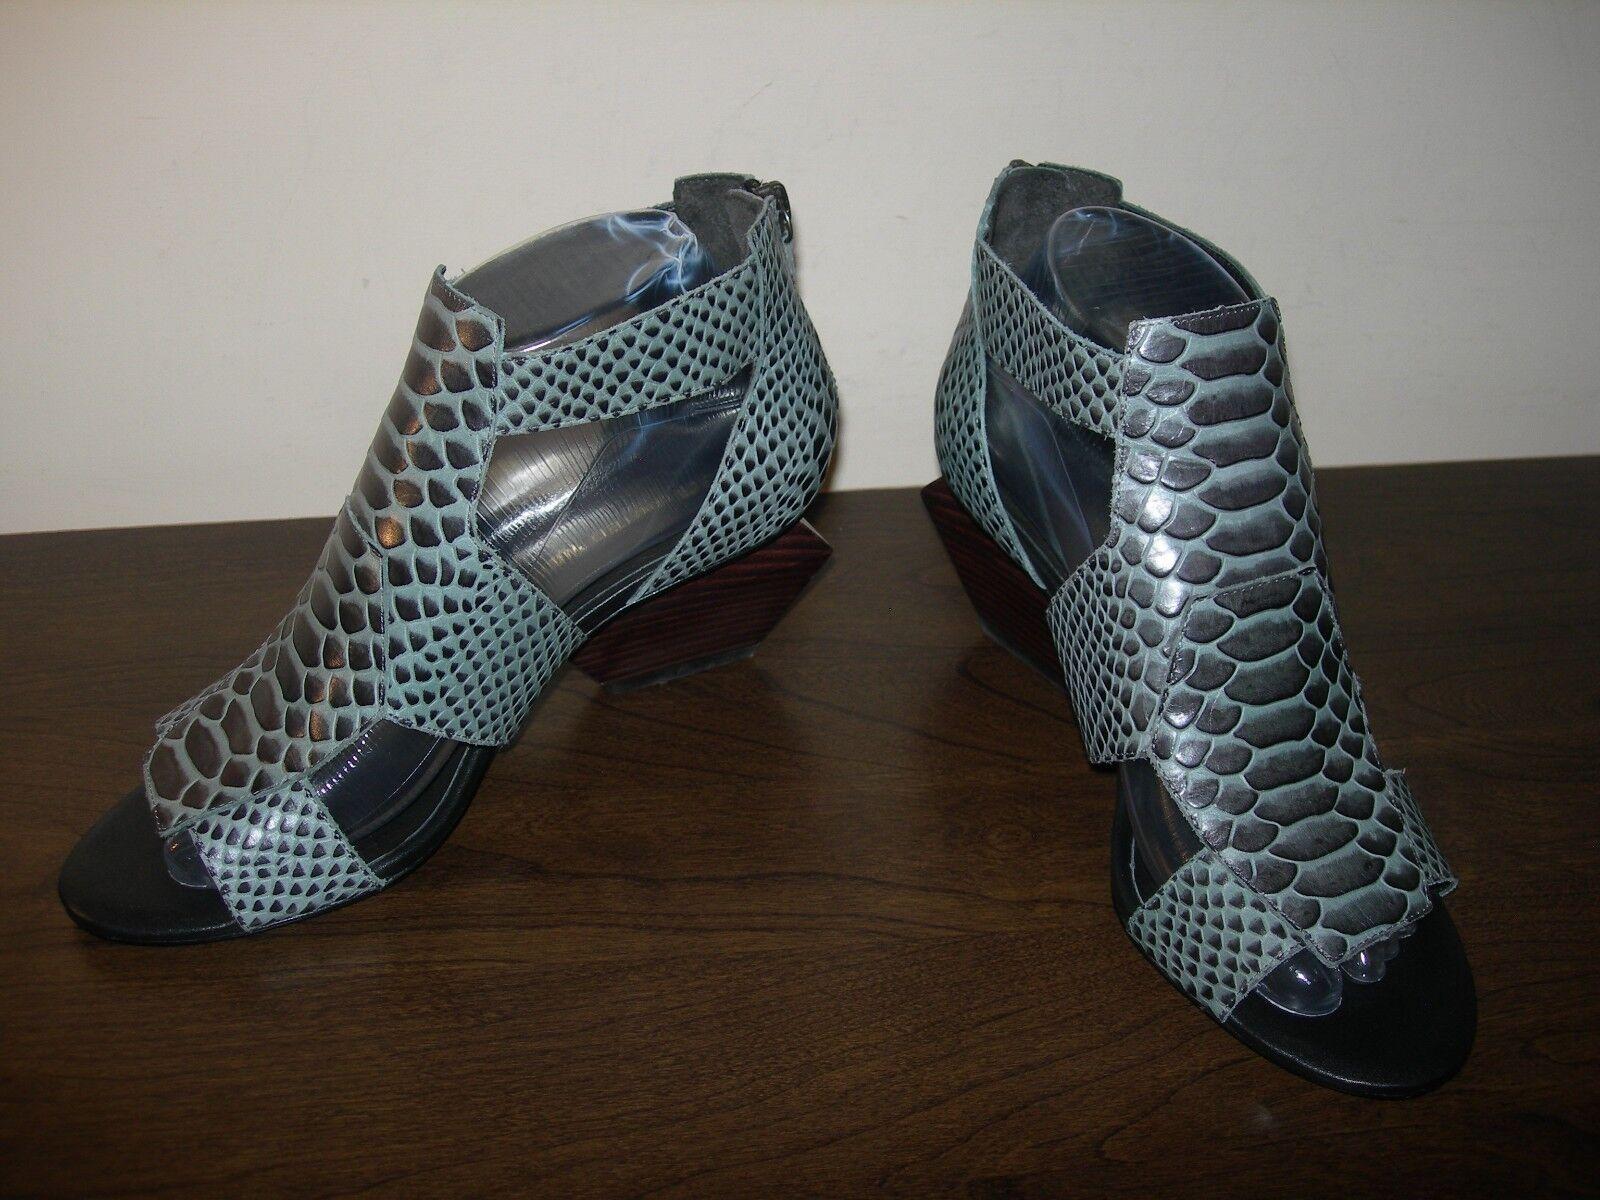 United Nude Chaussures Femmes Sandales Talons Cuir Imprimé Animal eu 38 UK 5 Slim